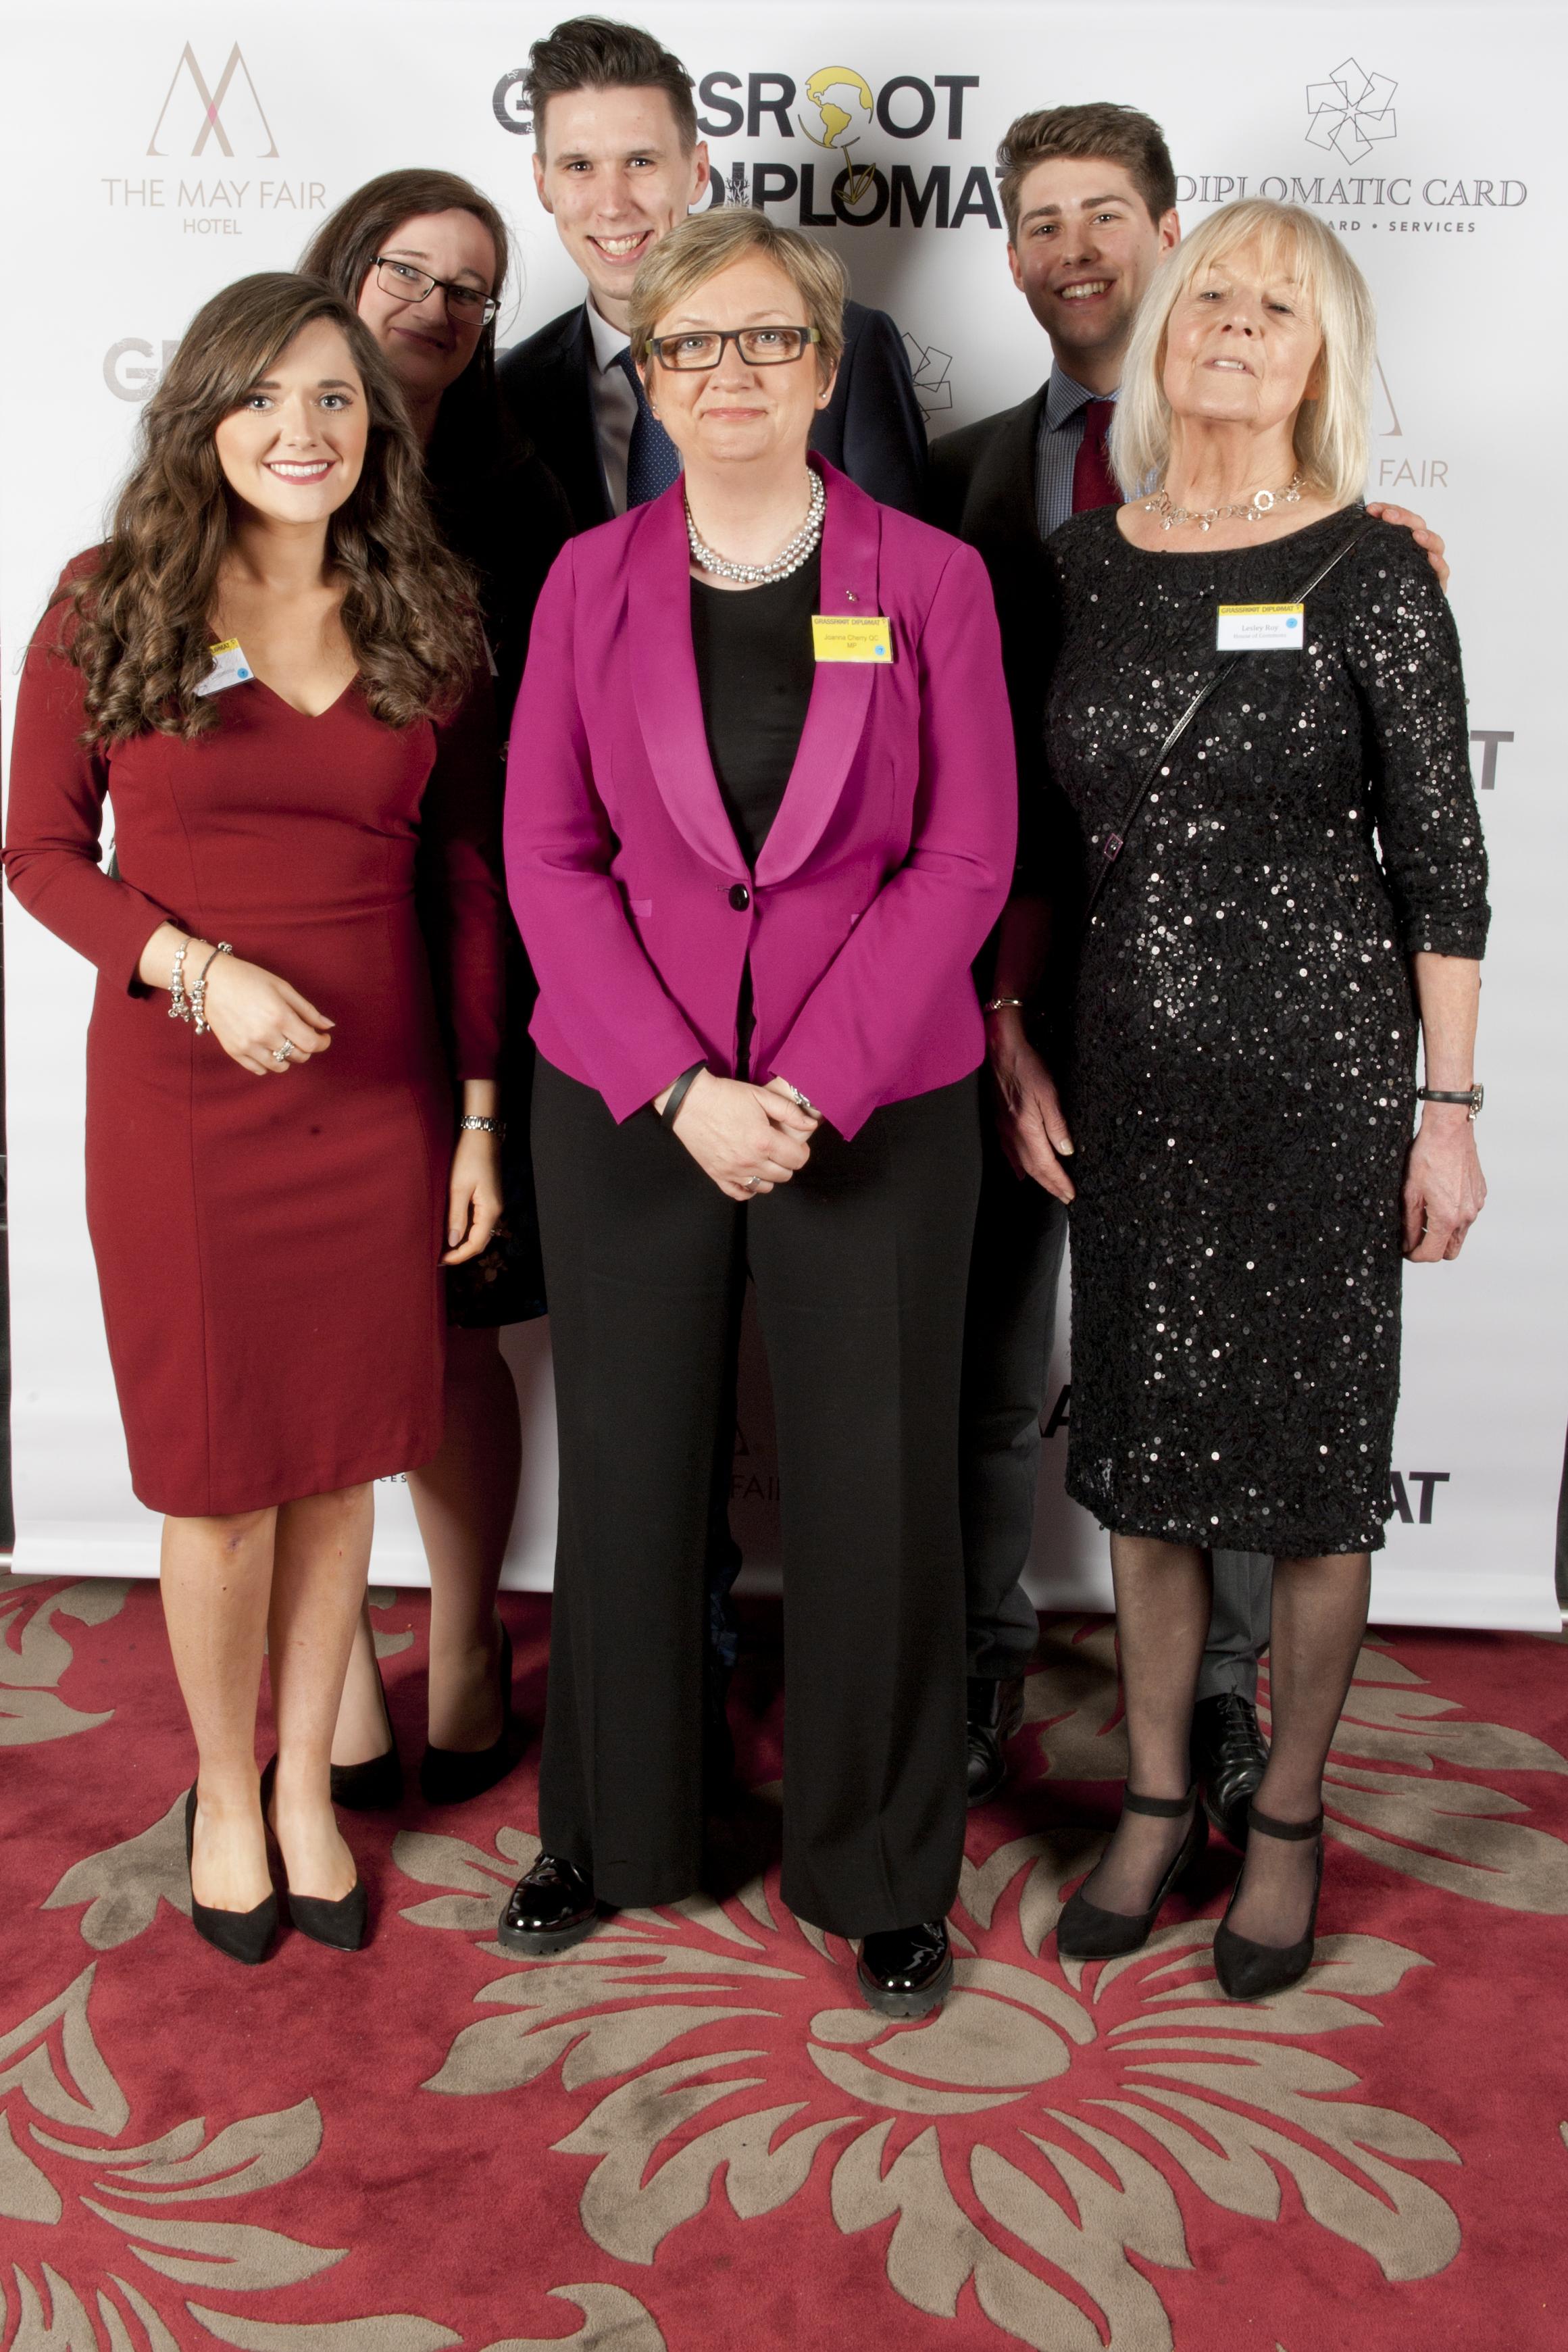 Joanna Cherry MP and staff